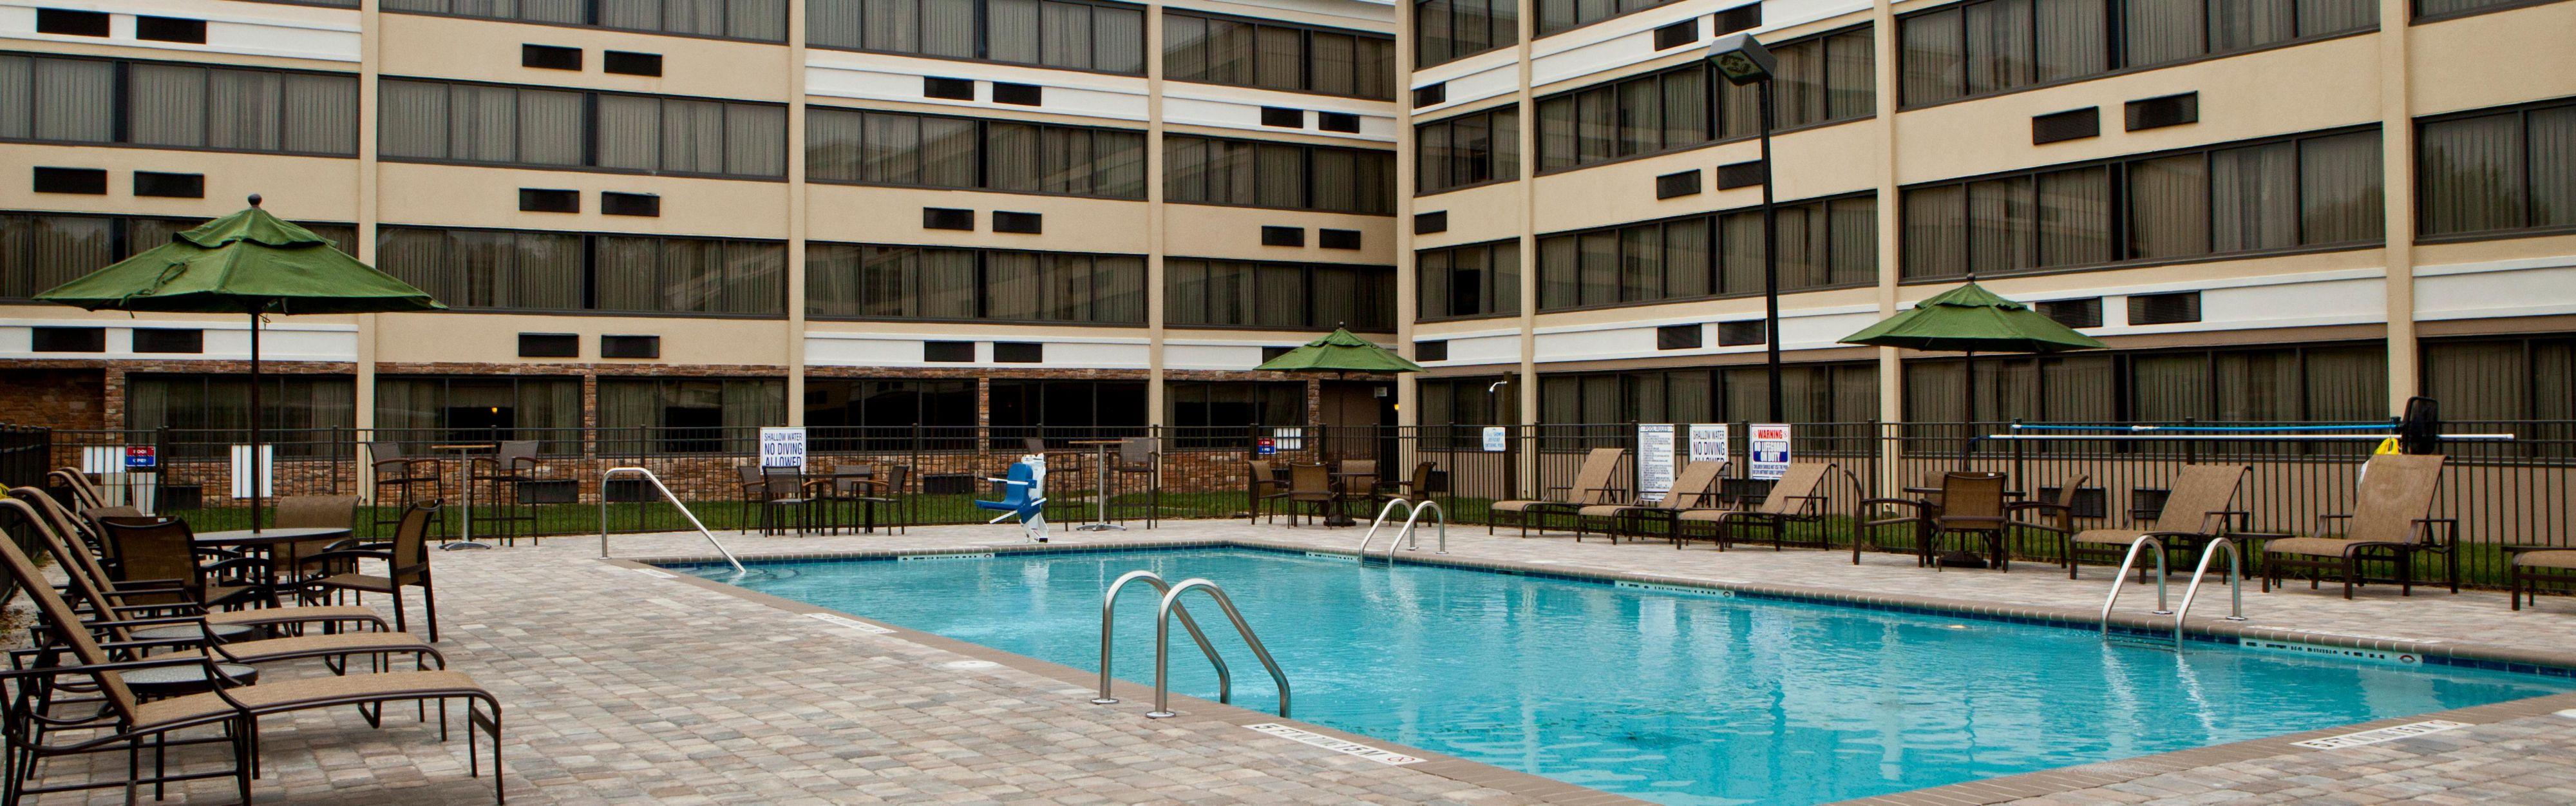 Holiday Inn Greensboro Airport image 2